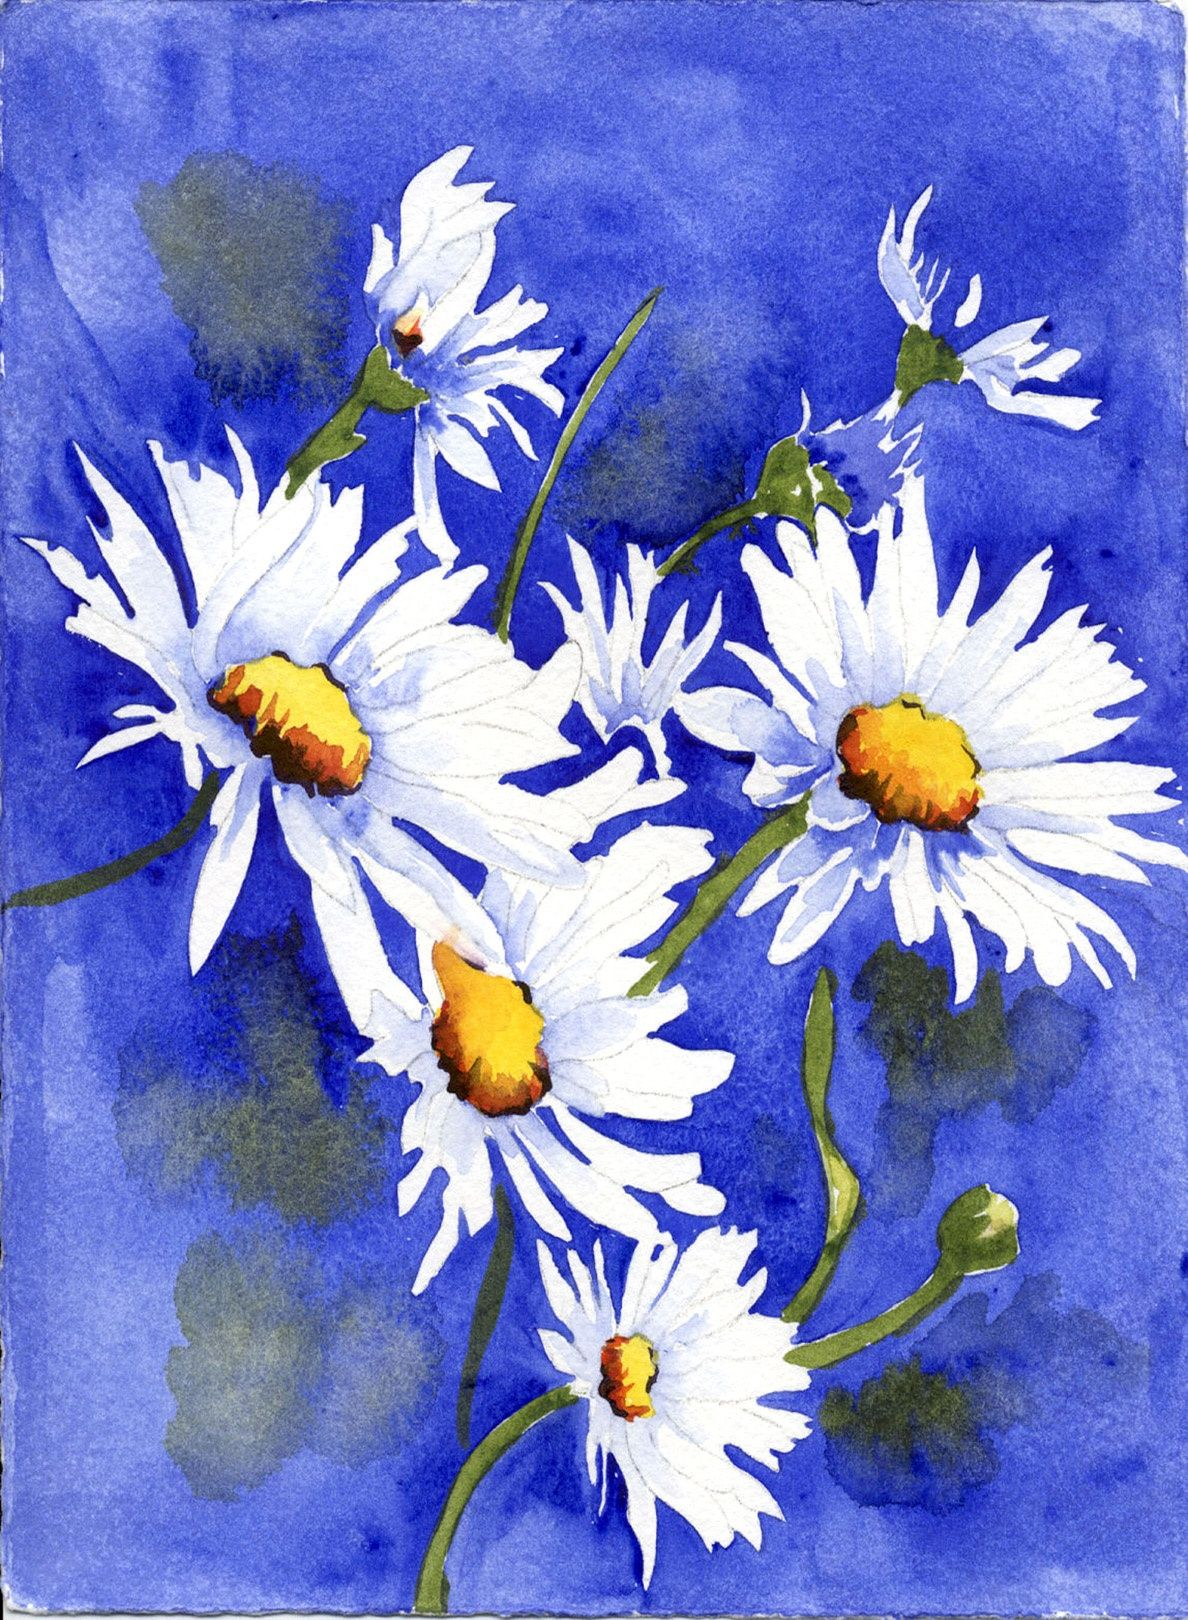 Watercolor Daisies